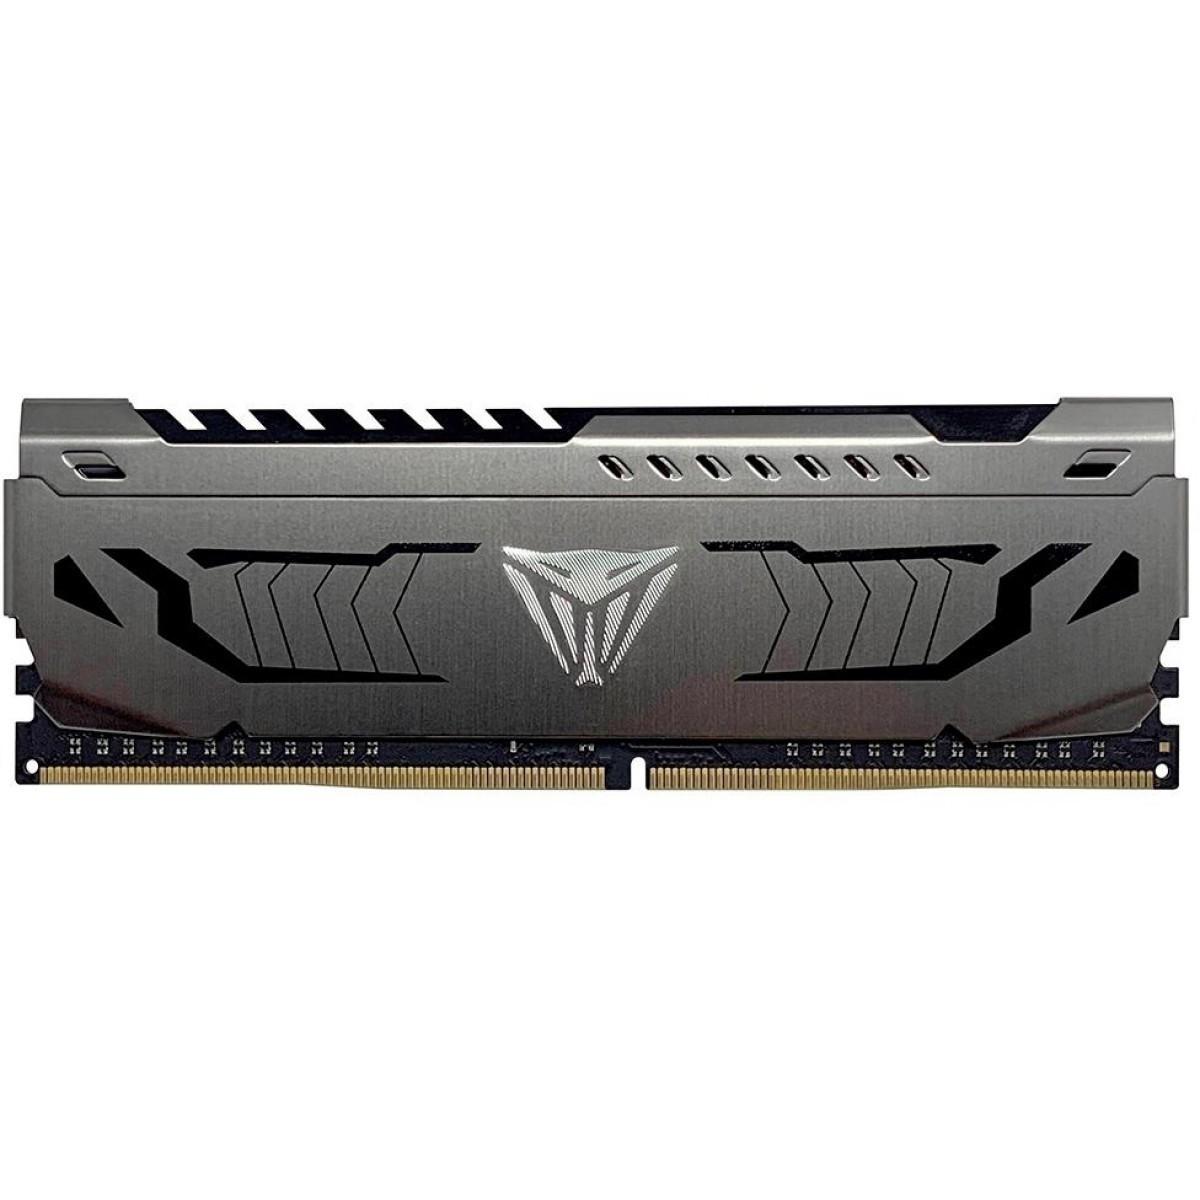 Memória DDR4 Patriot Viper Steel, 16GB 3600MHz, Gray, PVS416G360C8